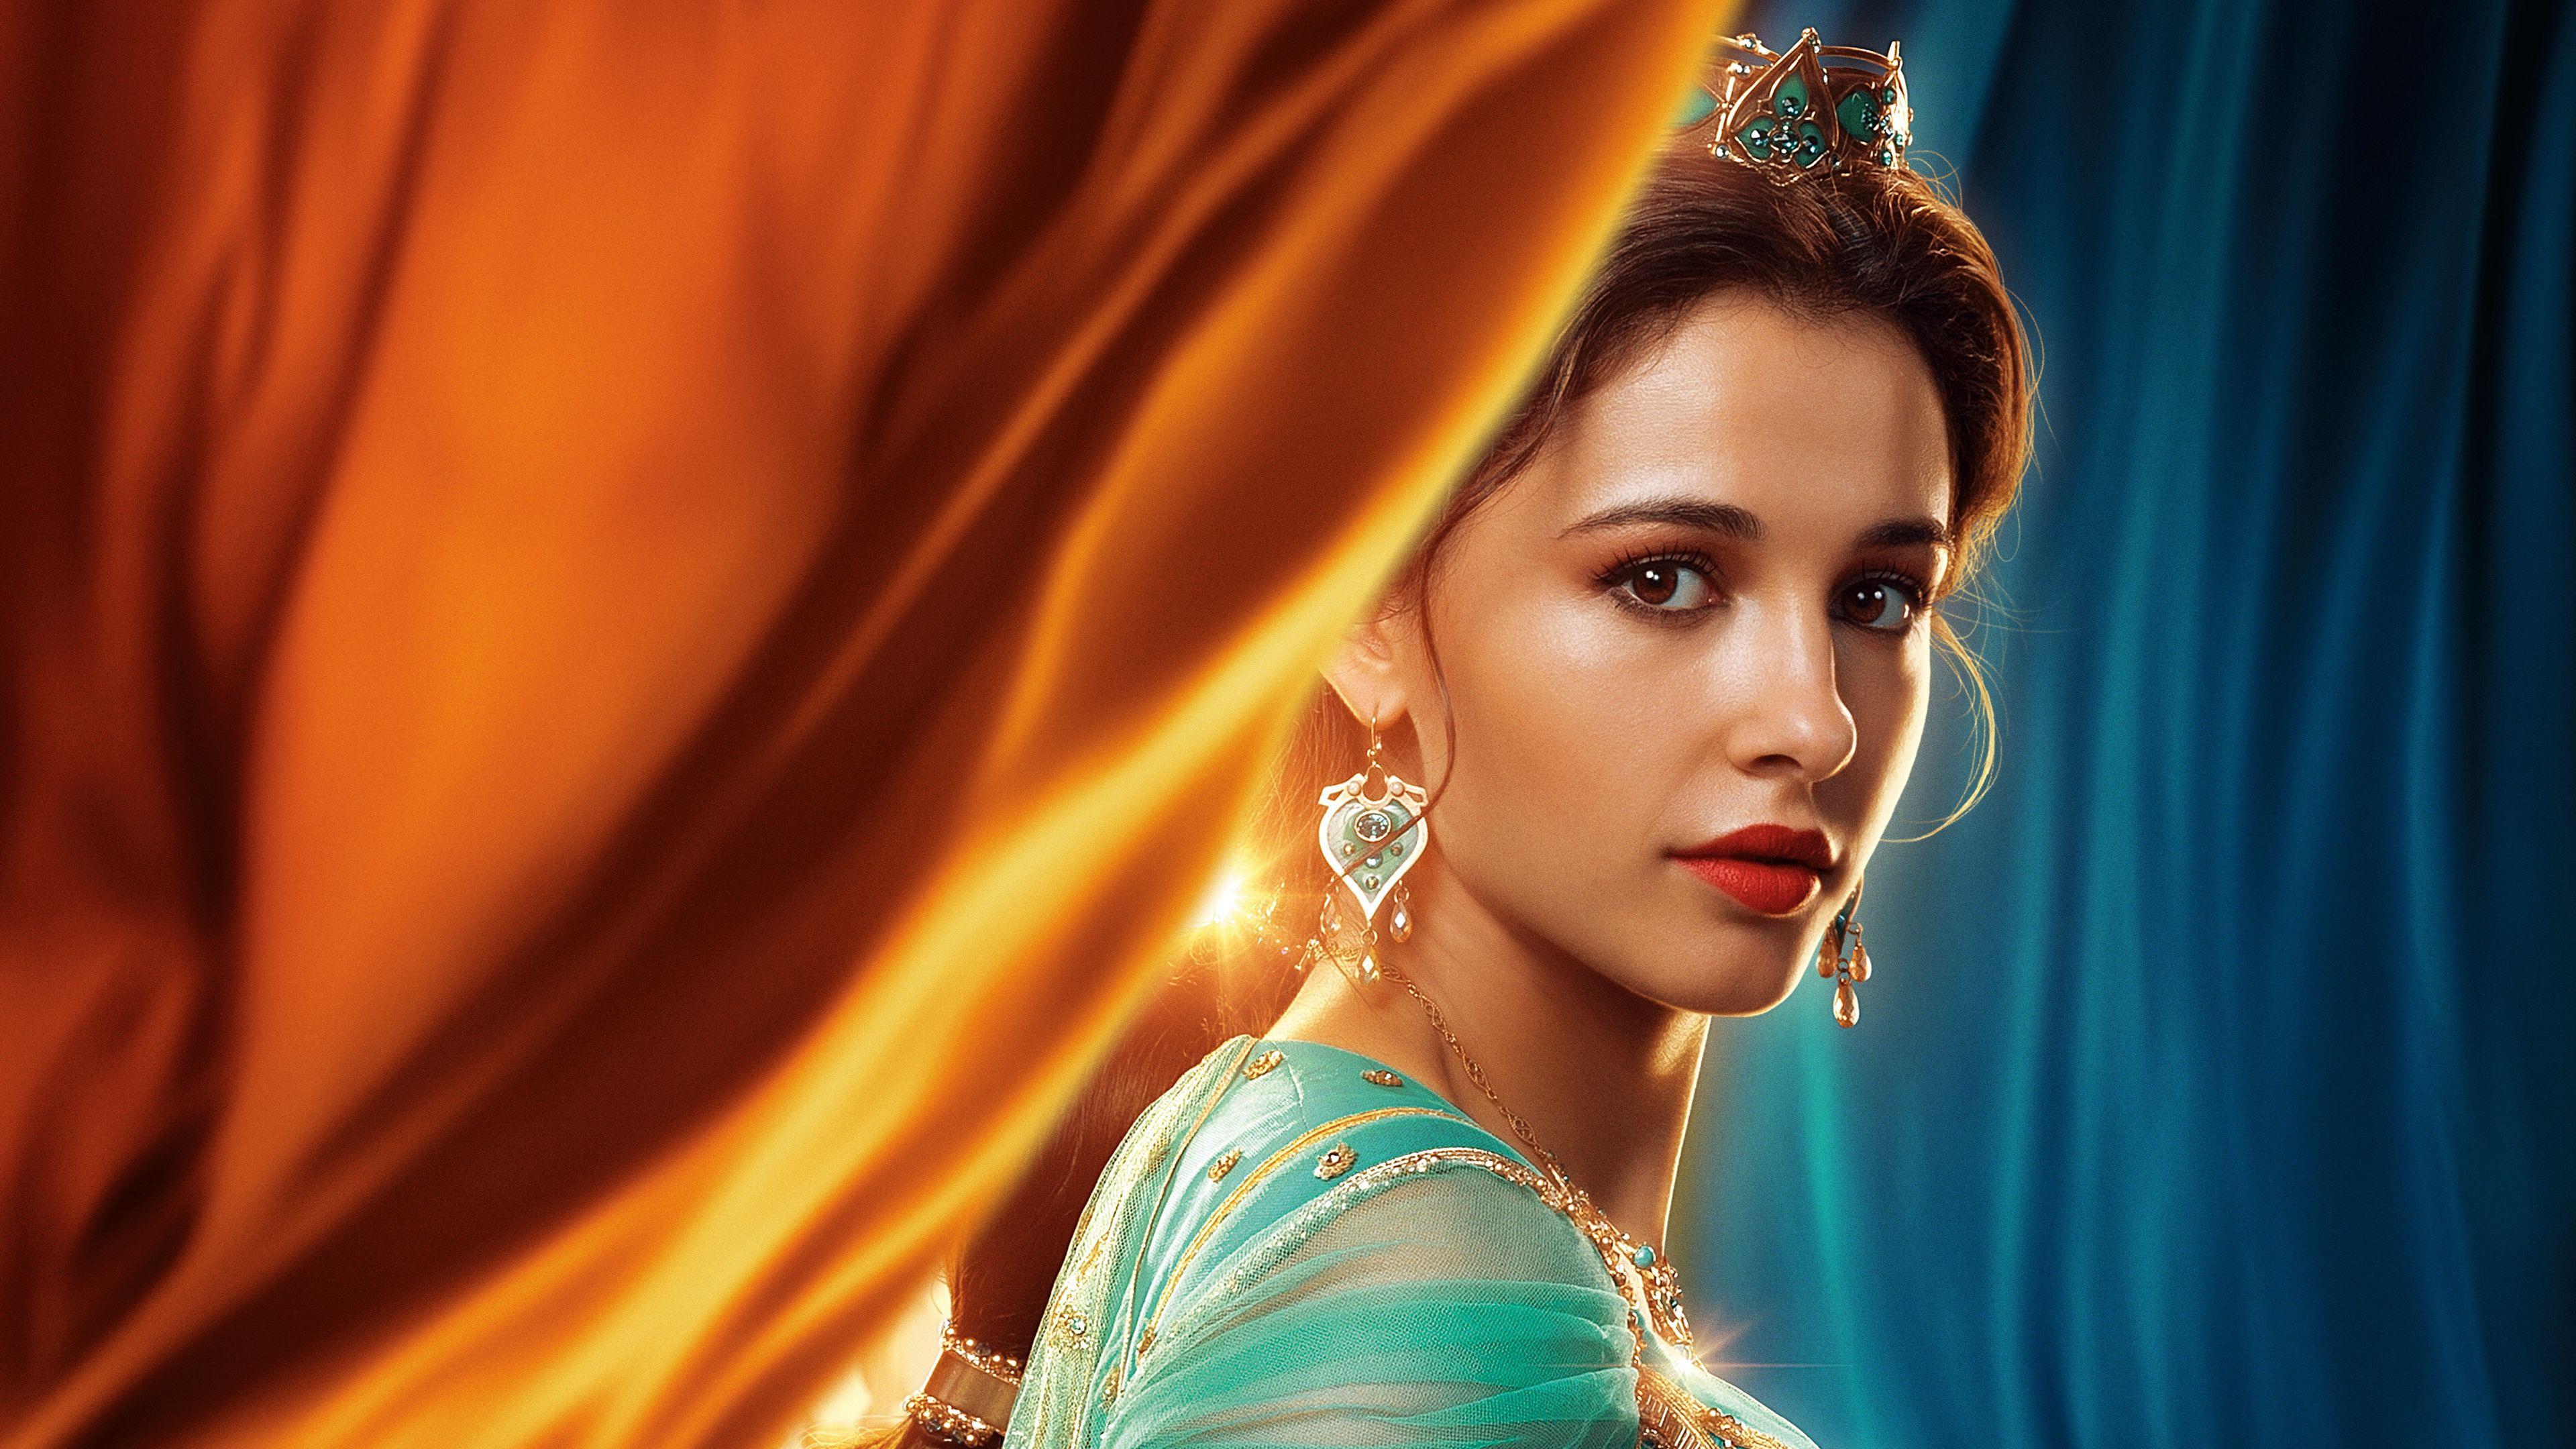 Wallpaper 4k Princess Jasmine In Aladdin 2019 4k 2019 Movies